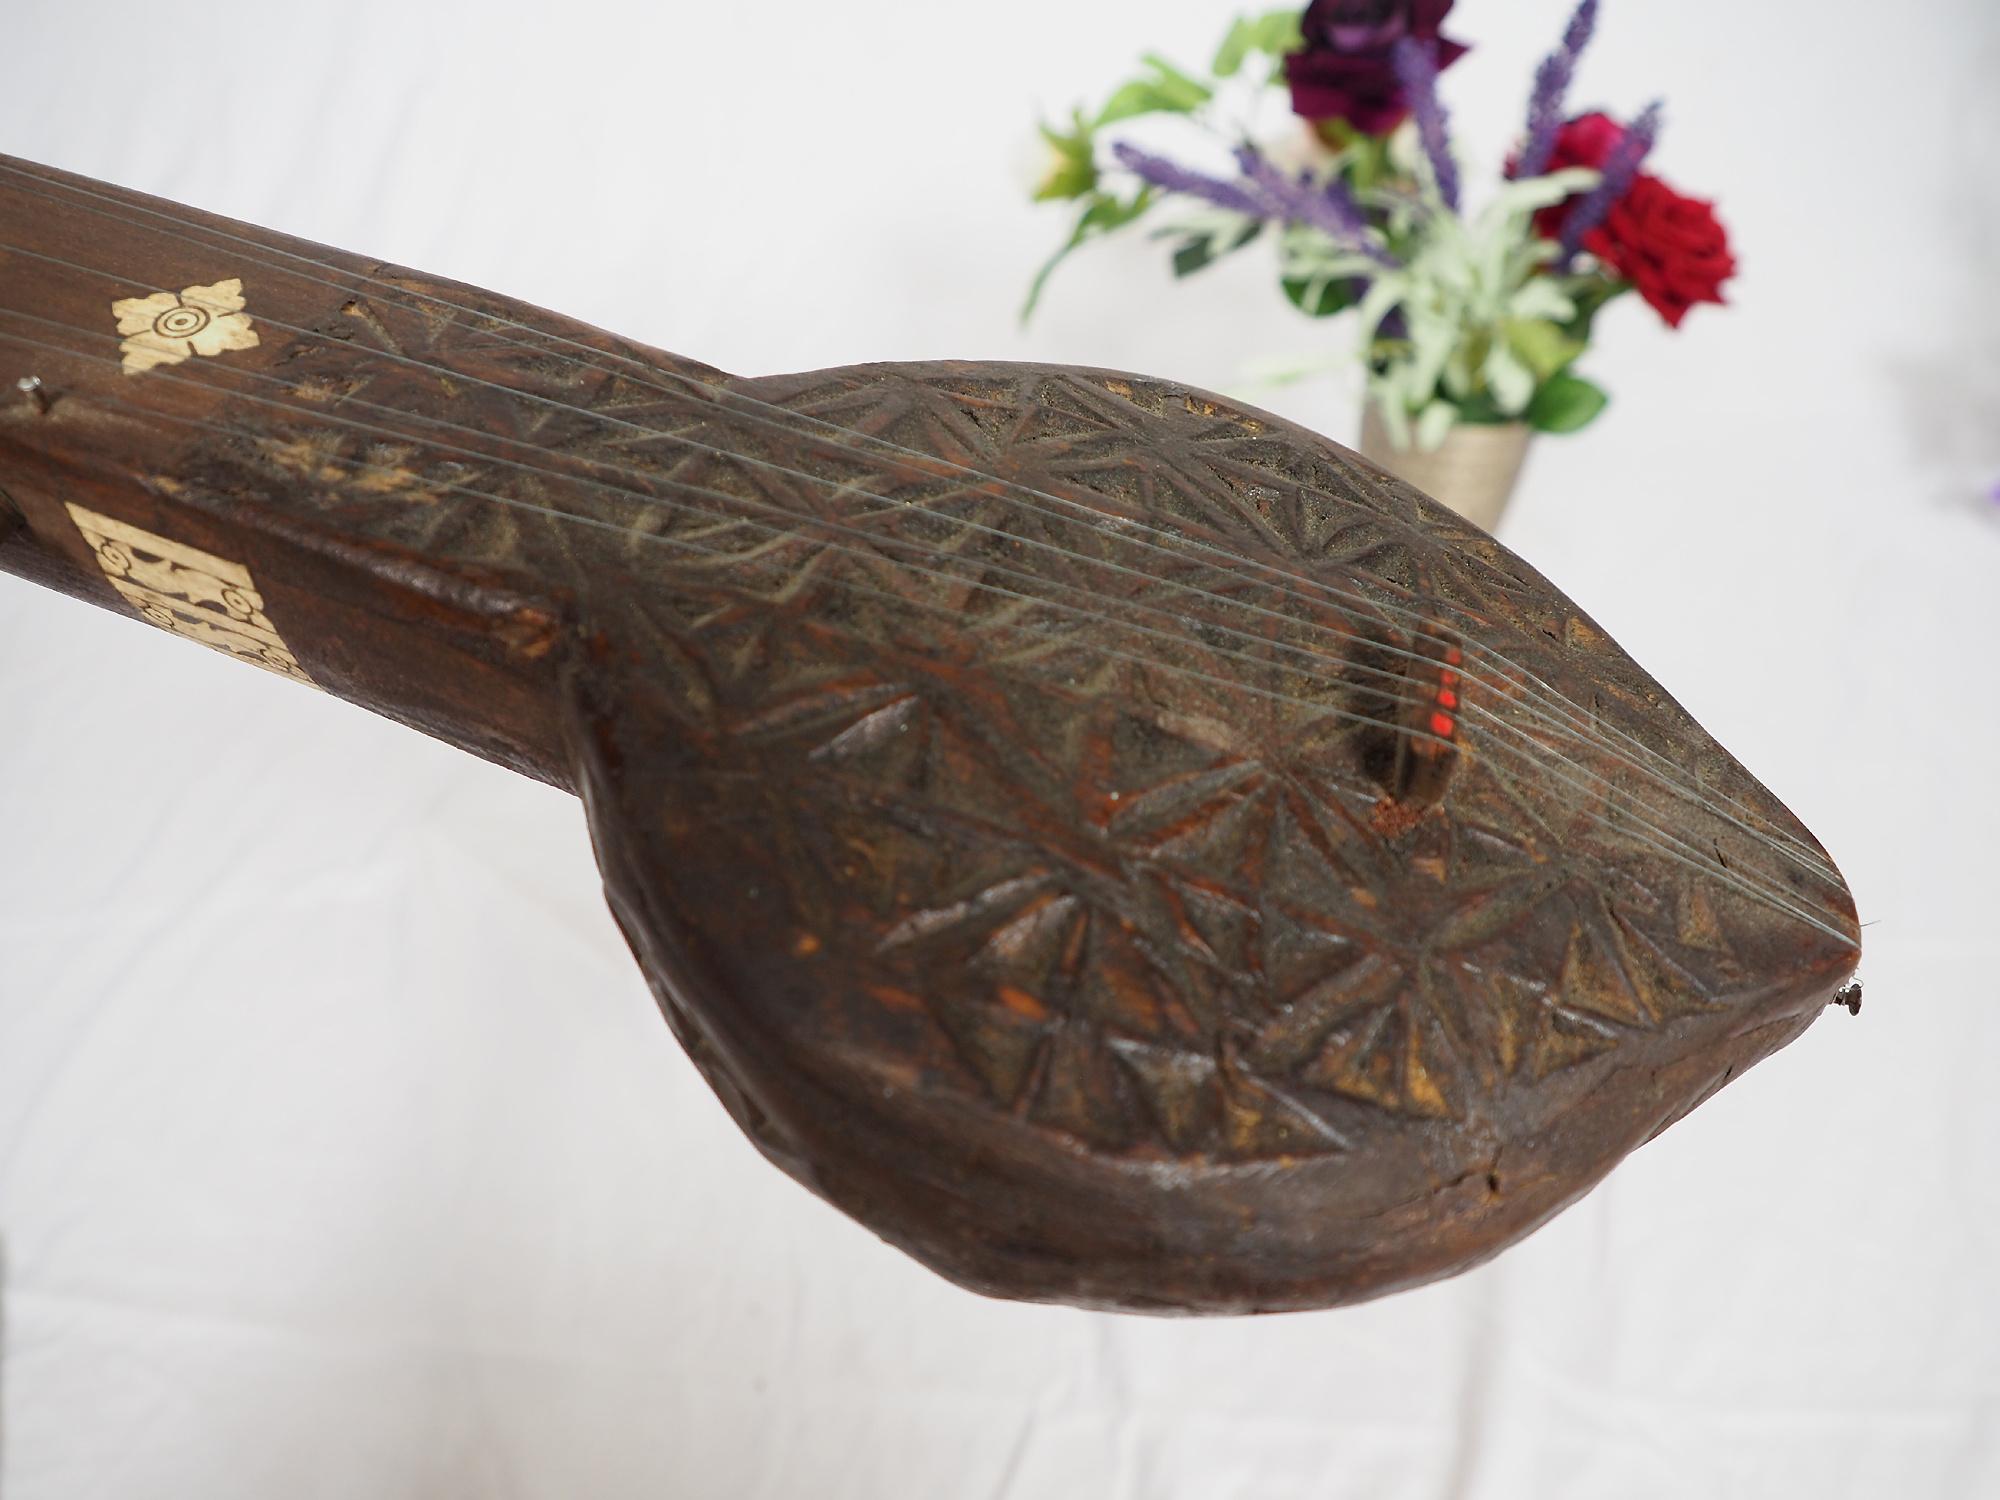 small afghan folk music instrument Tambur Tanbur tanboor from Afghanaistan  Bone inlay تنبور No:21/E